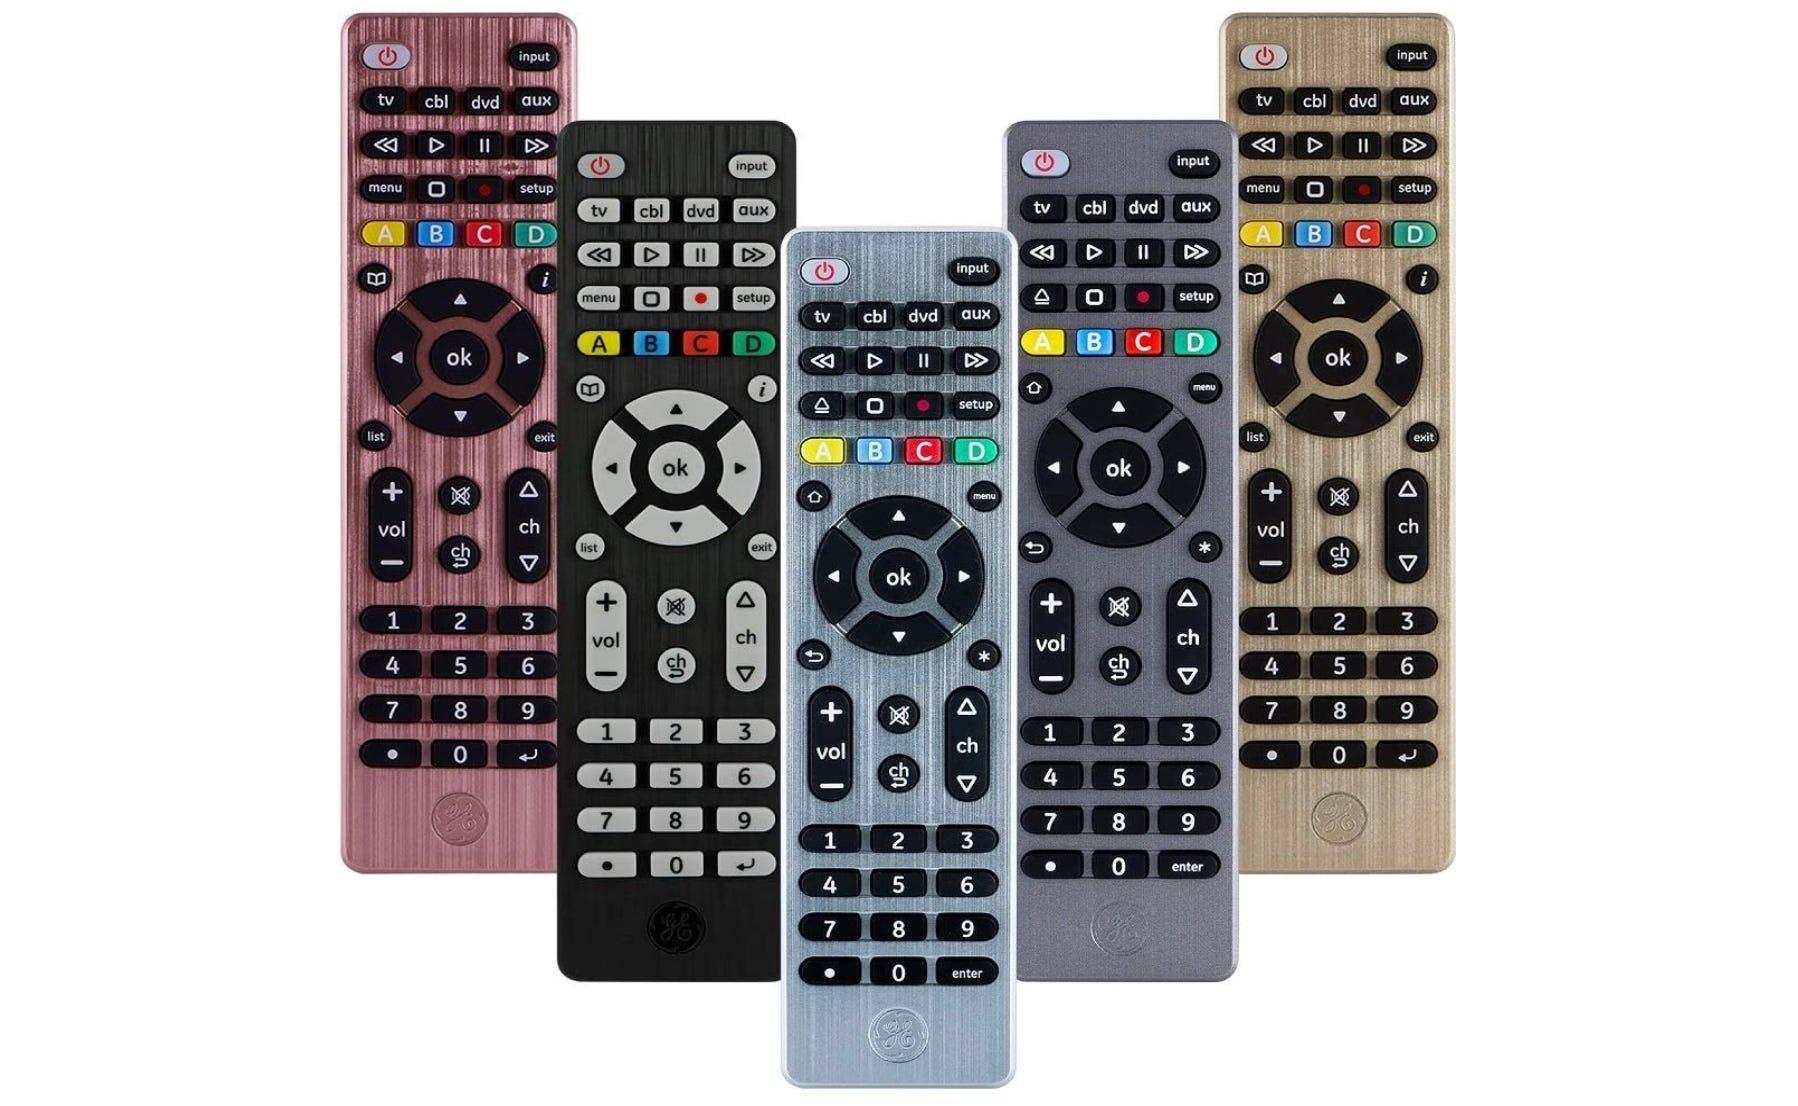 ge universal remote, ge remote